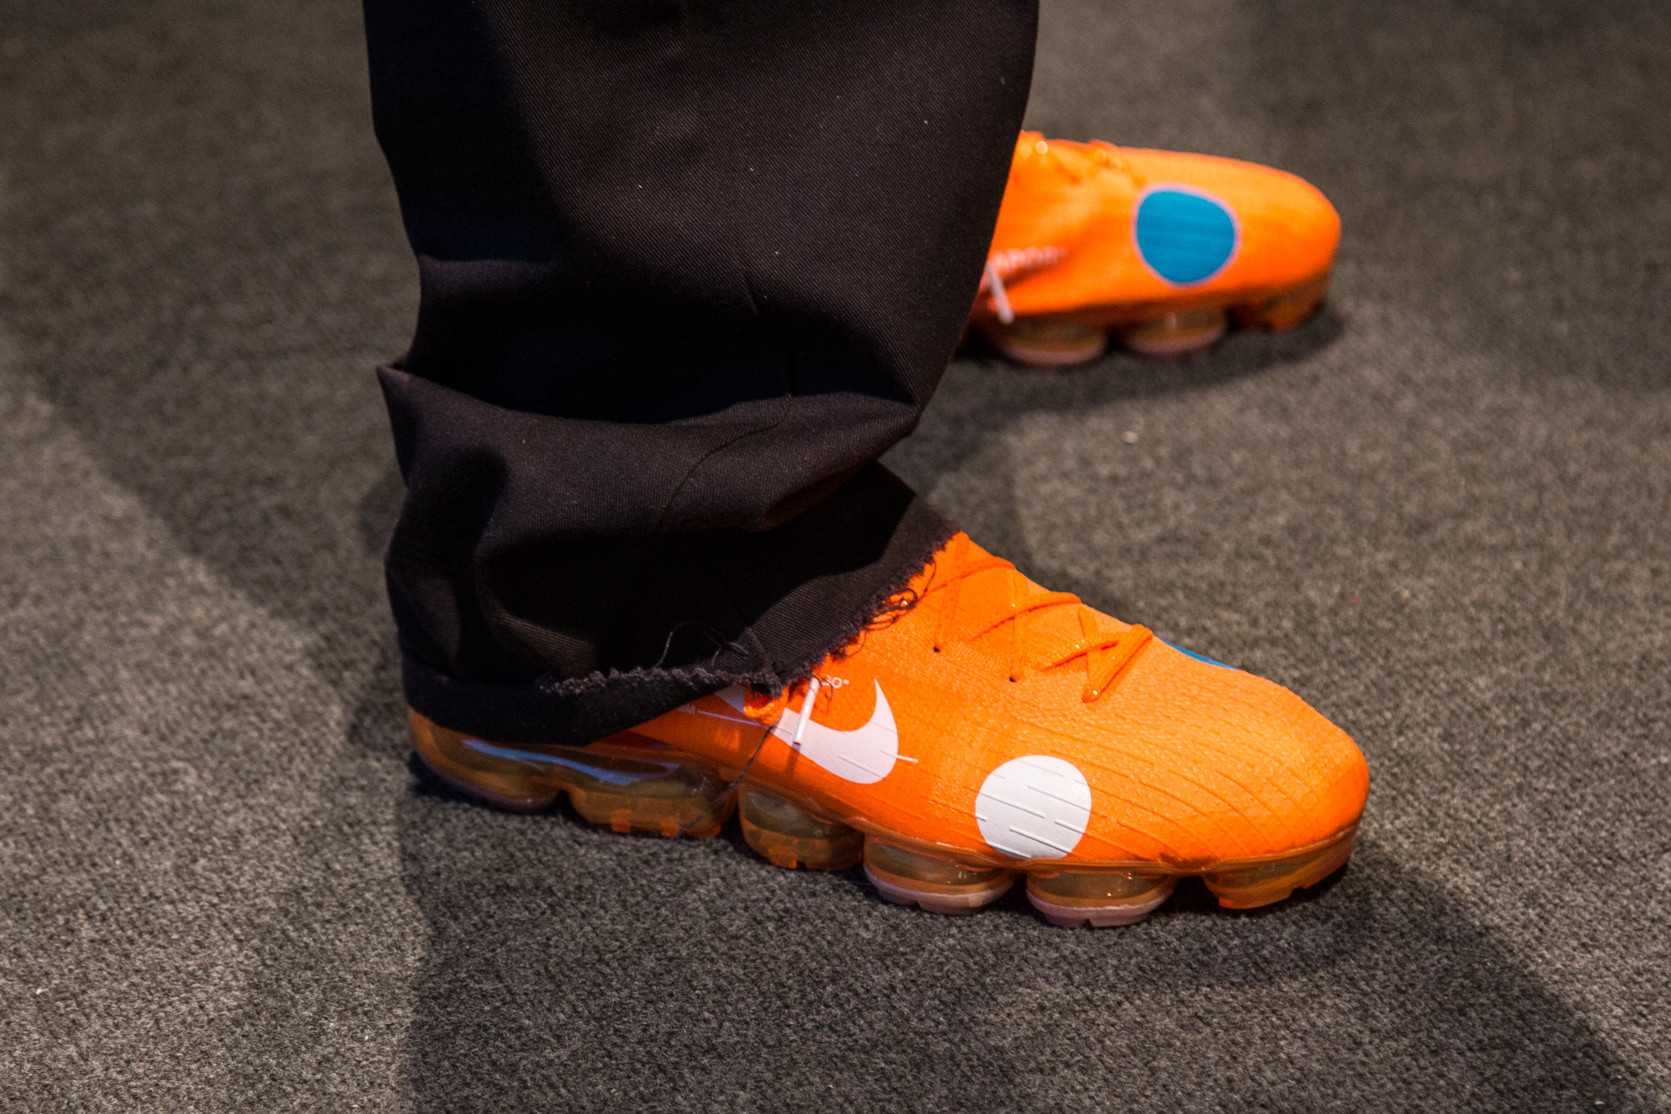 Nike Mercurial Vapormax Hybrid